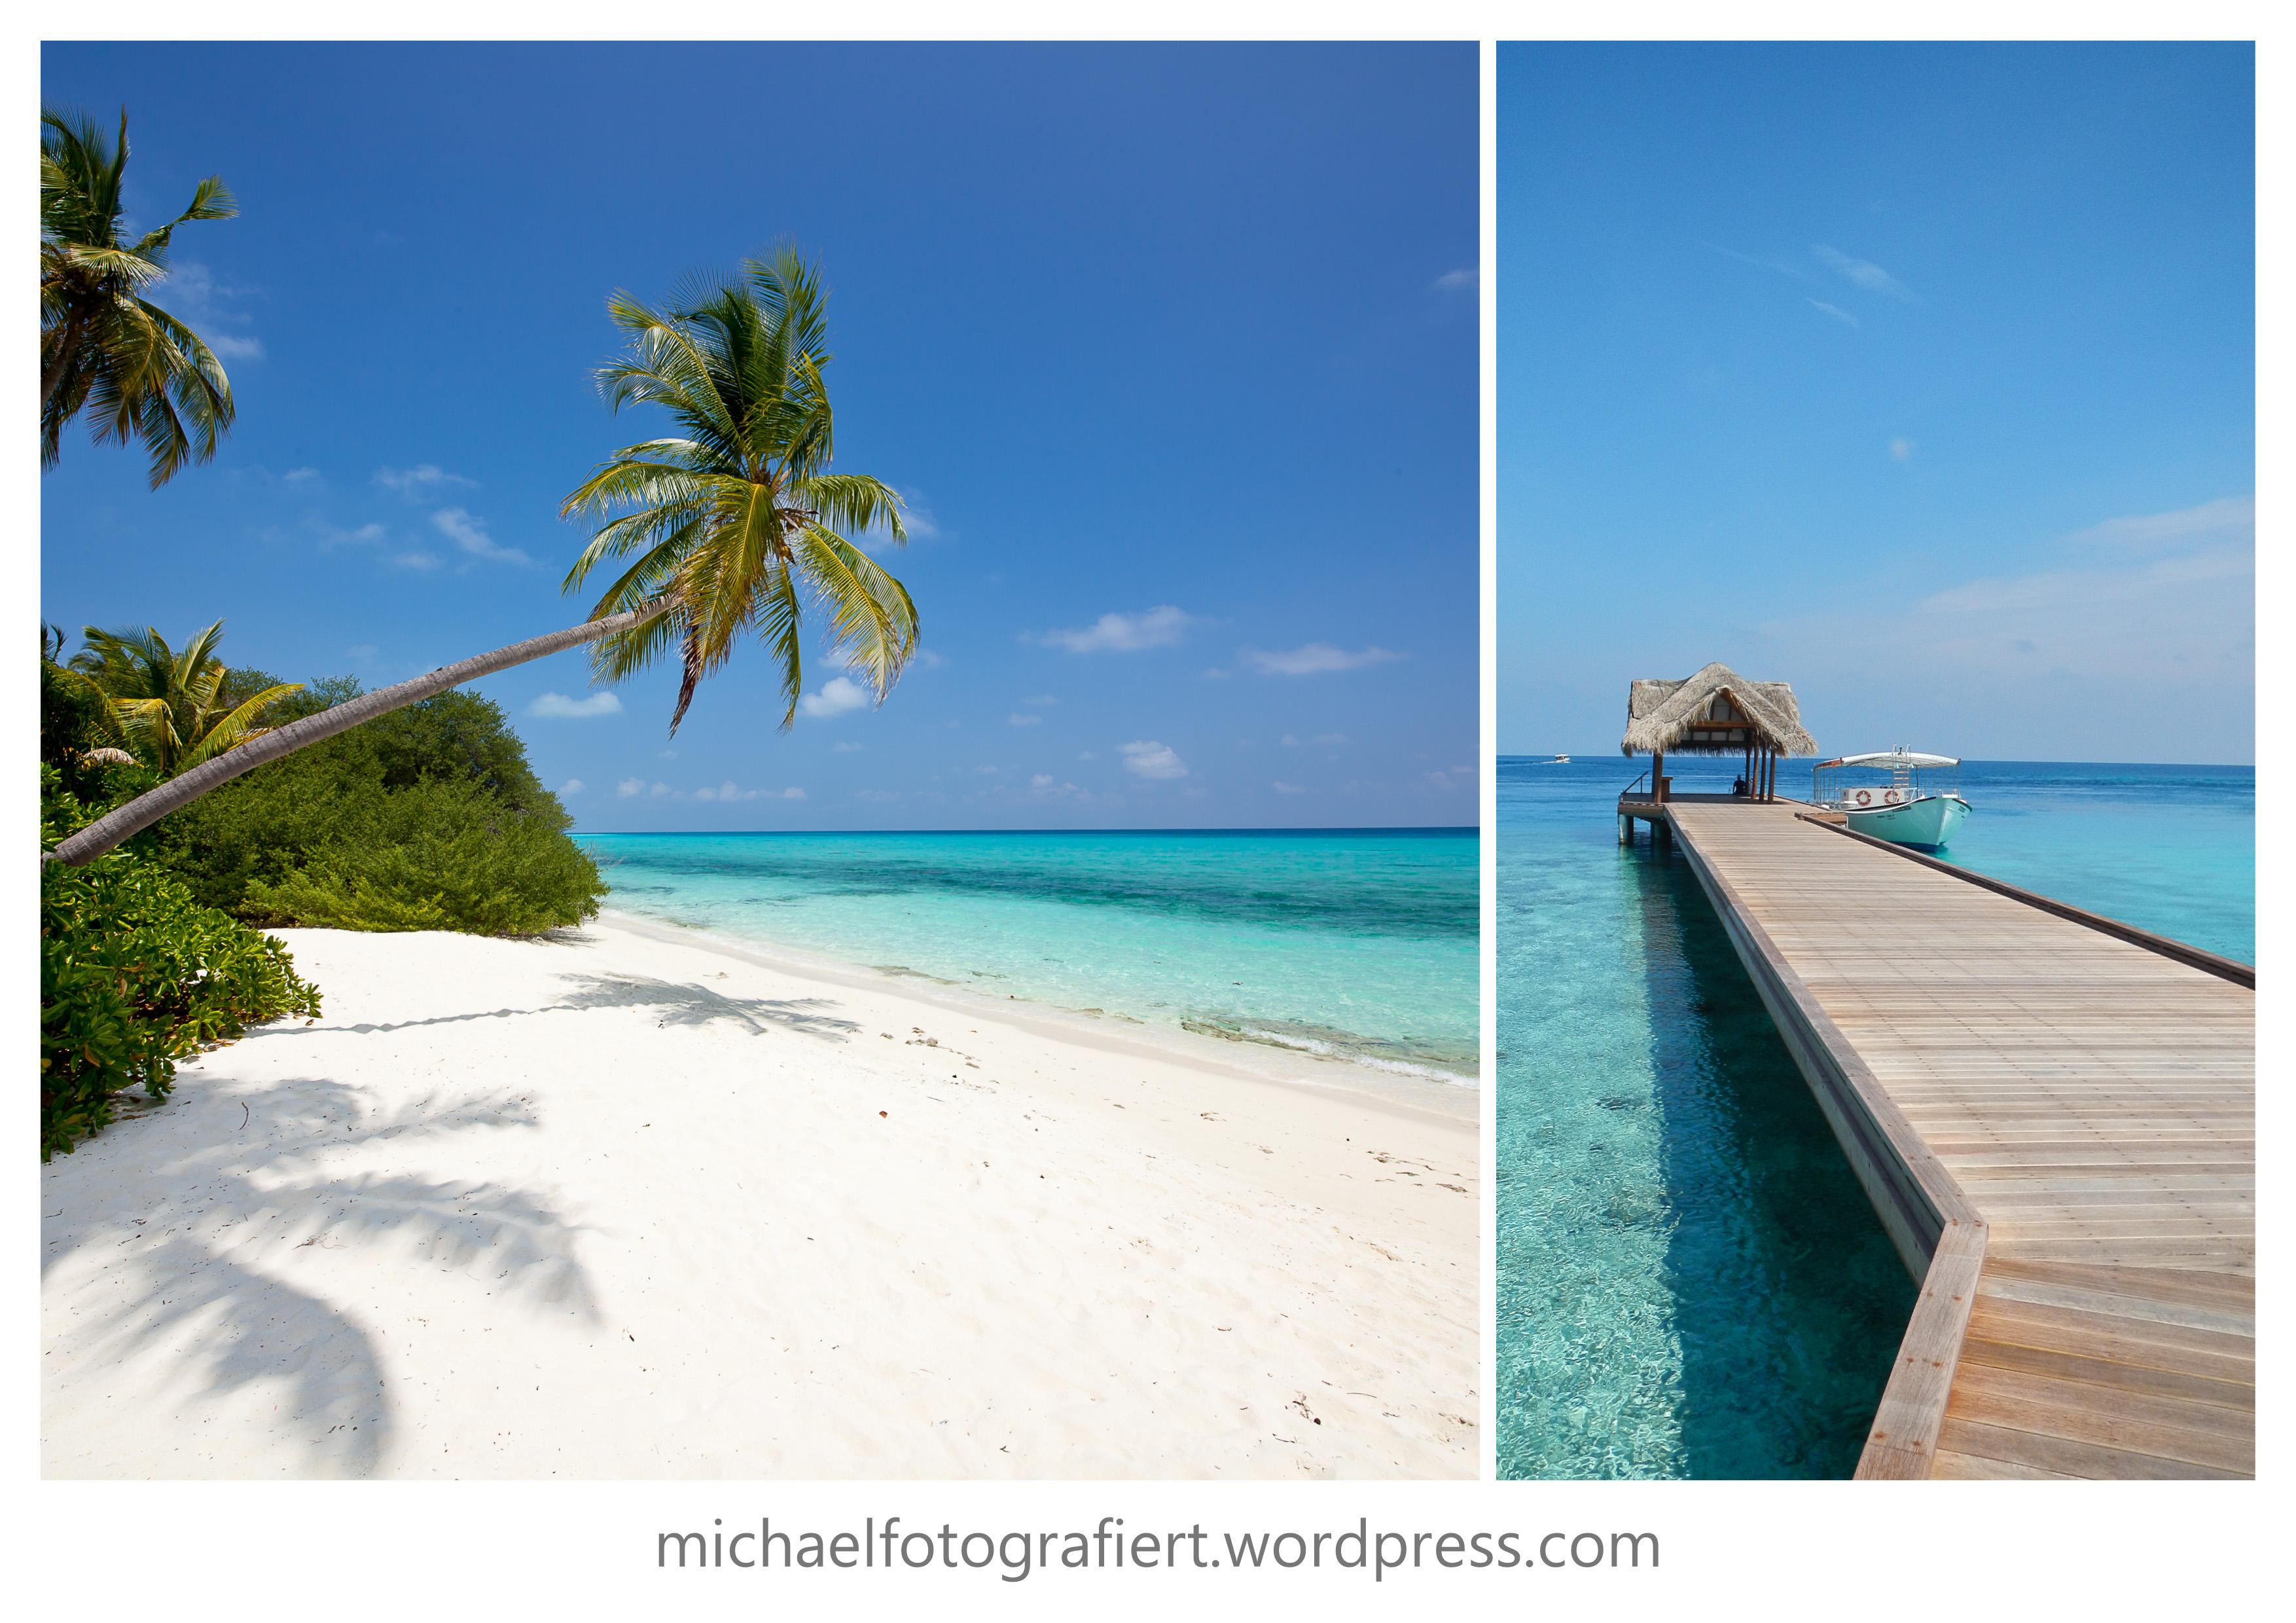 malediven tropisch meer strand - photo #15